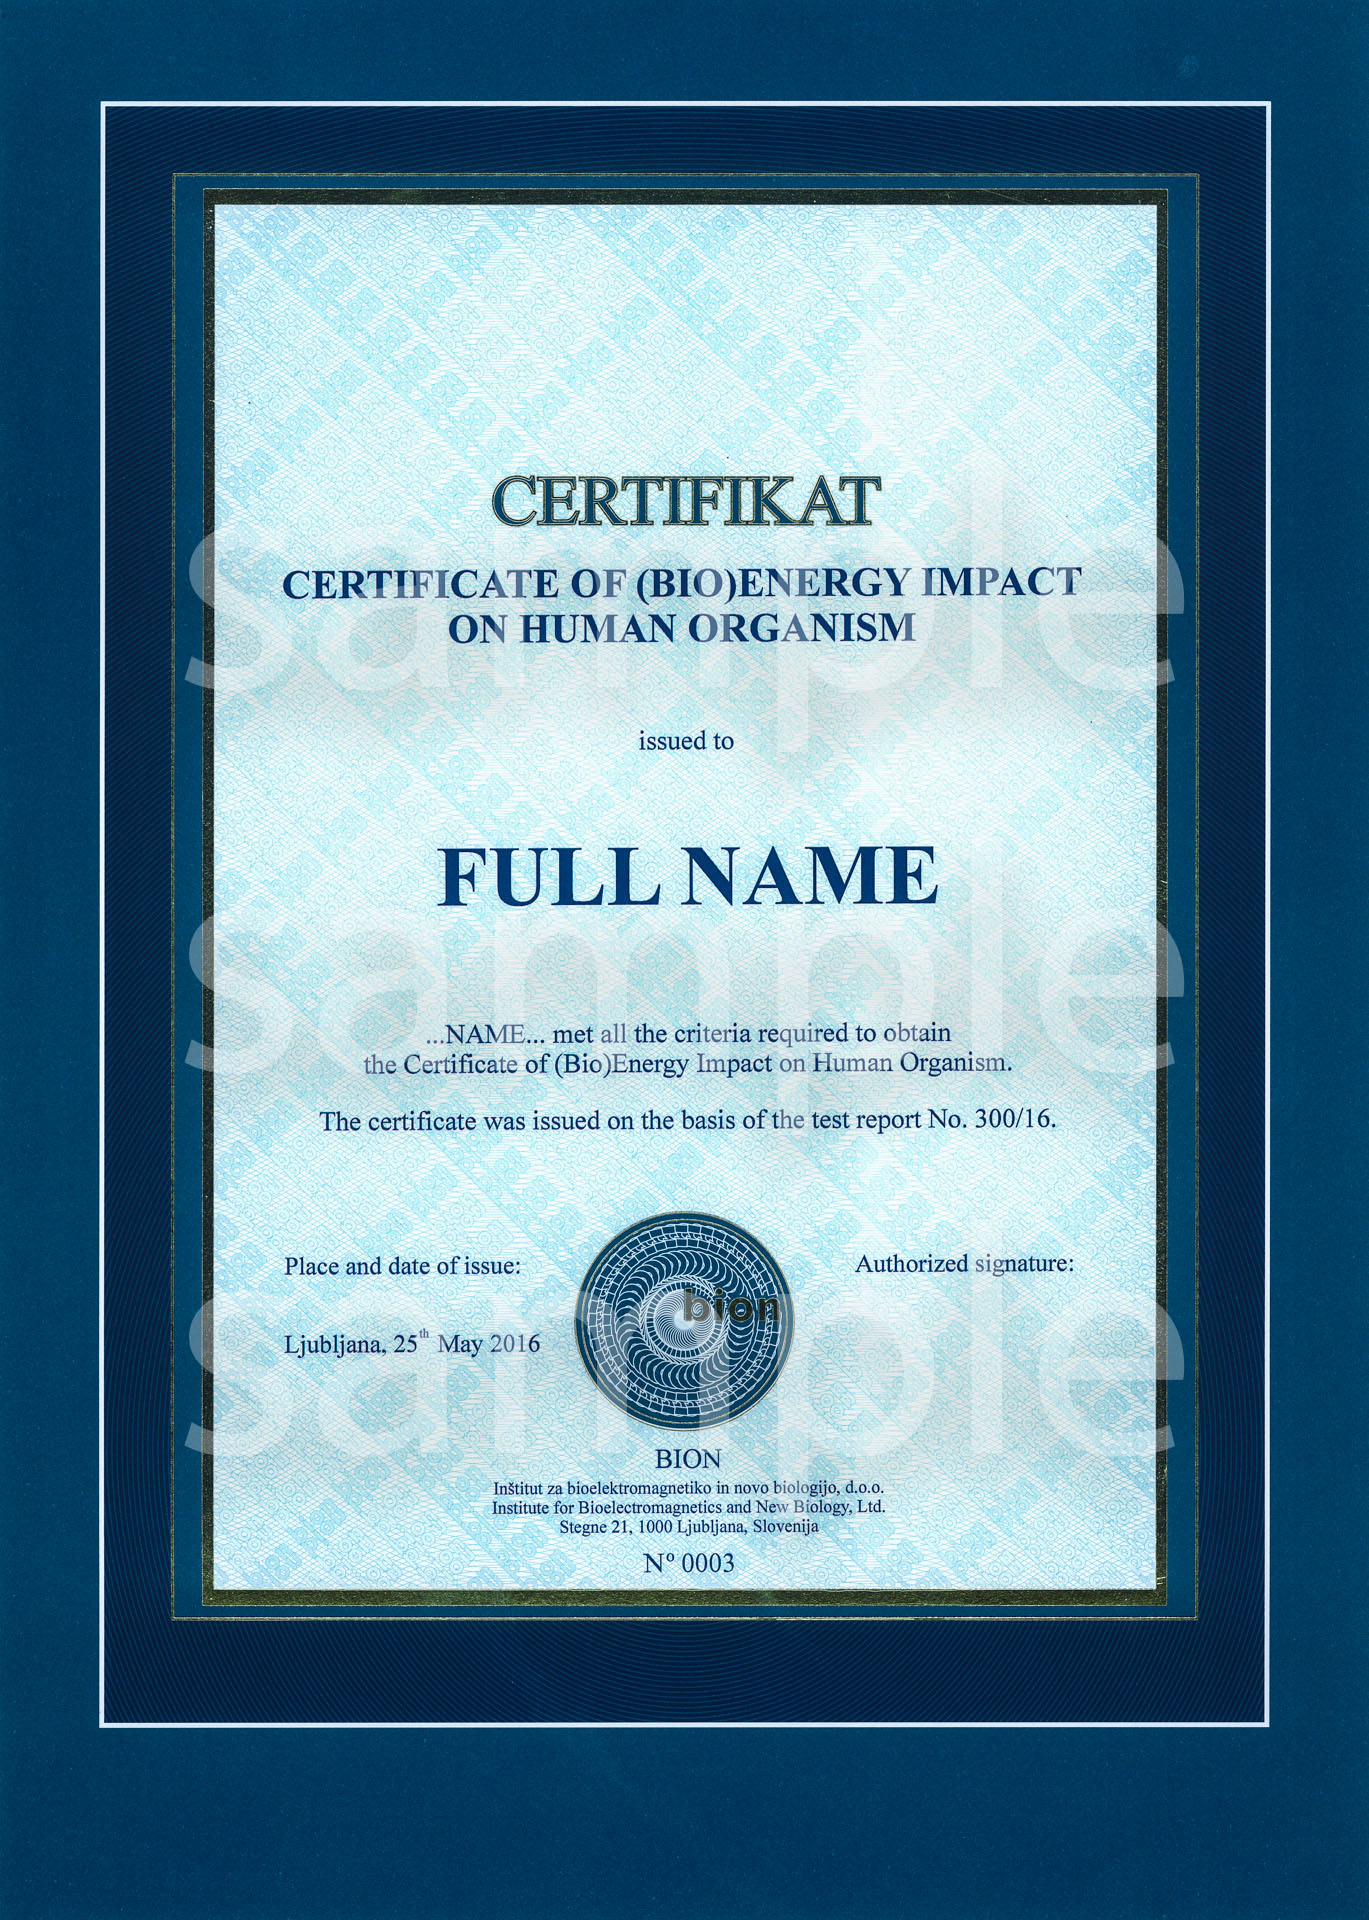 bion_institute-certifikat_of_bioenergy_impact